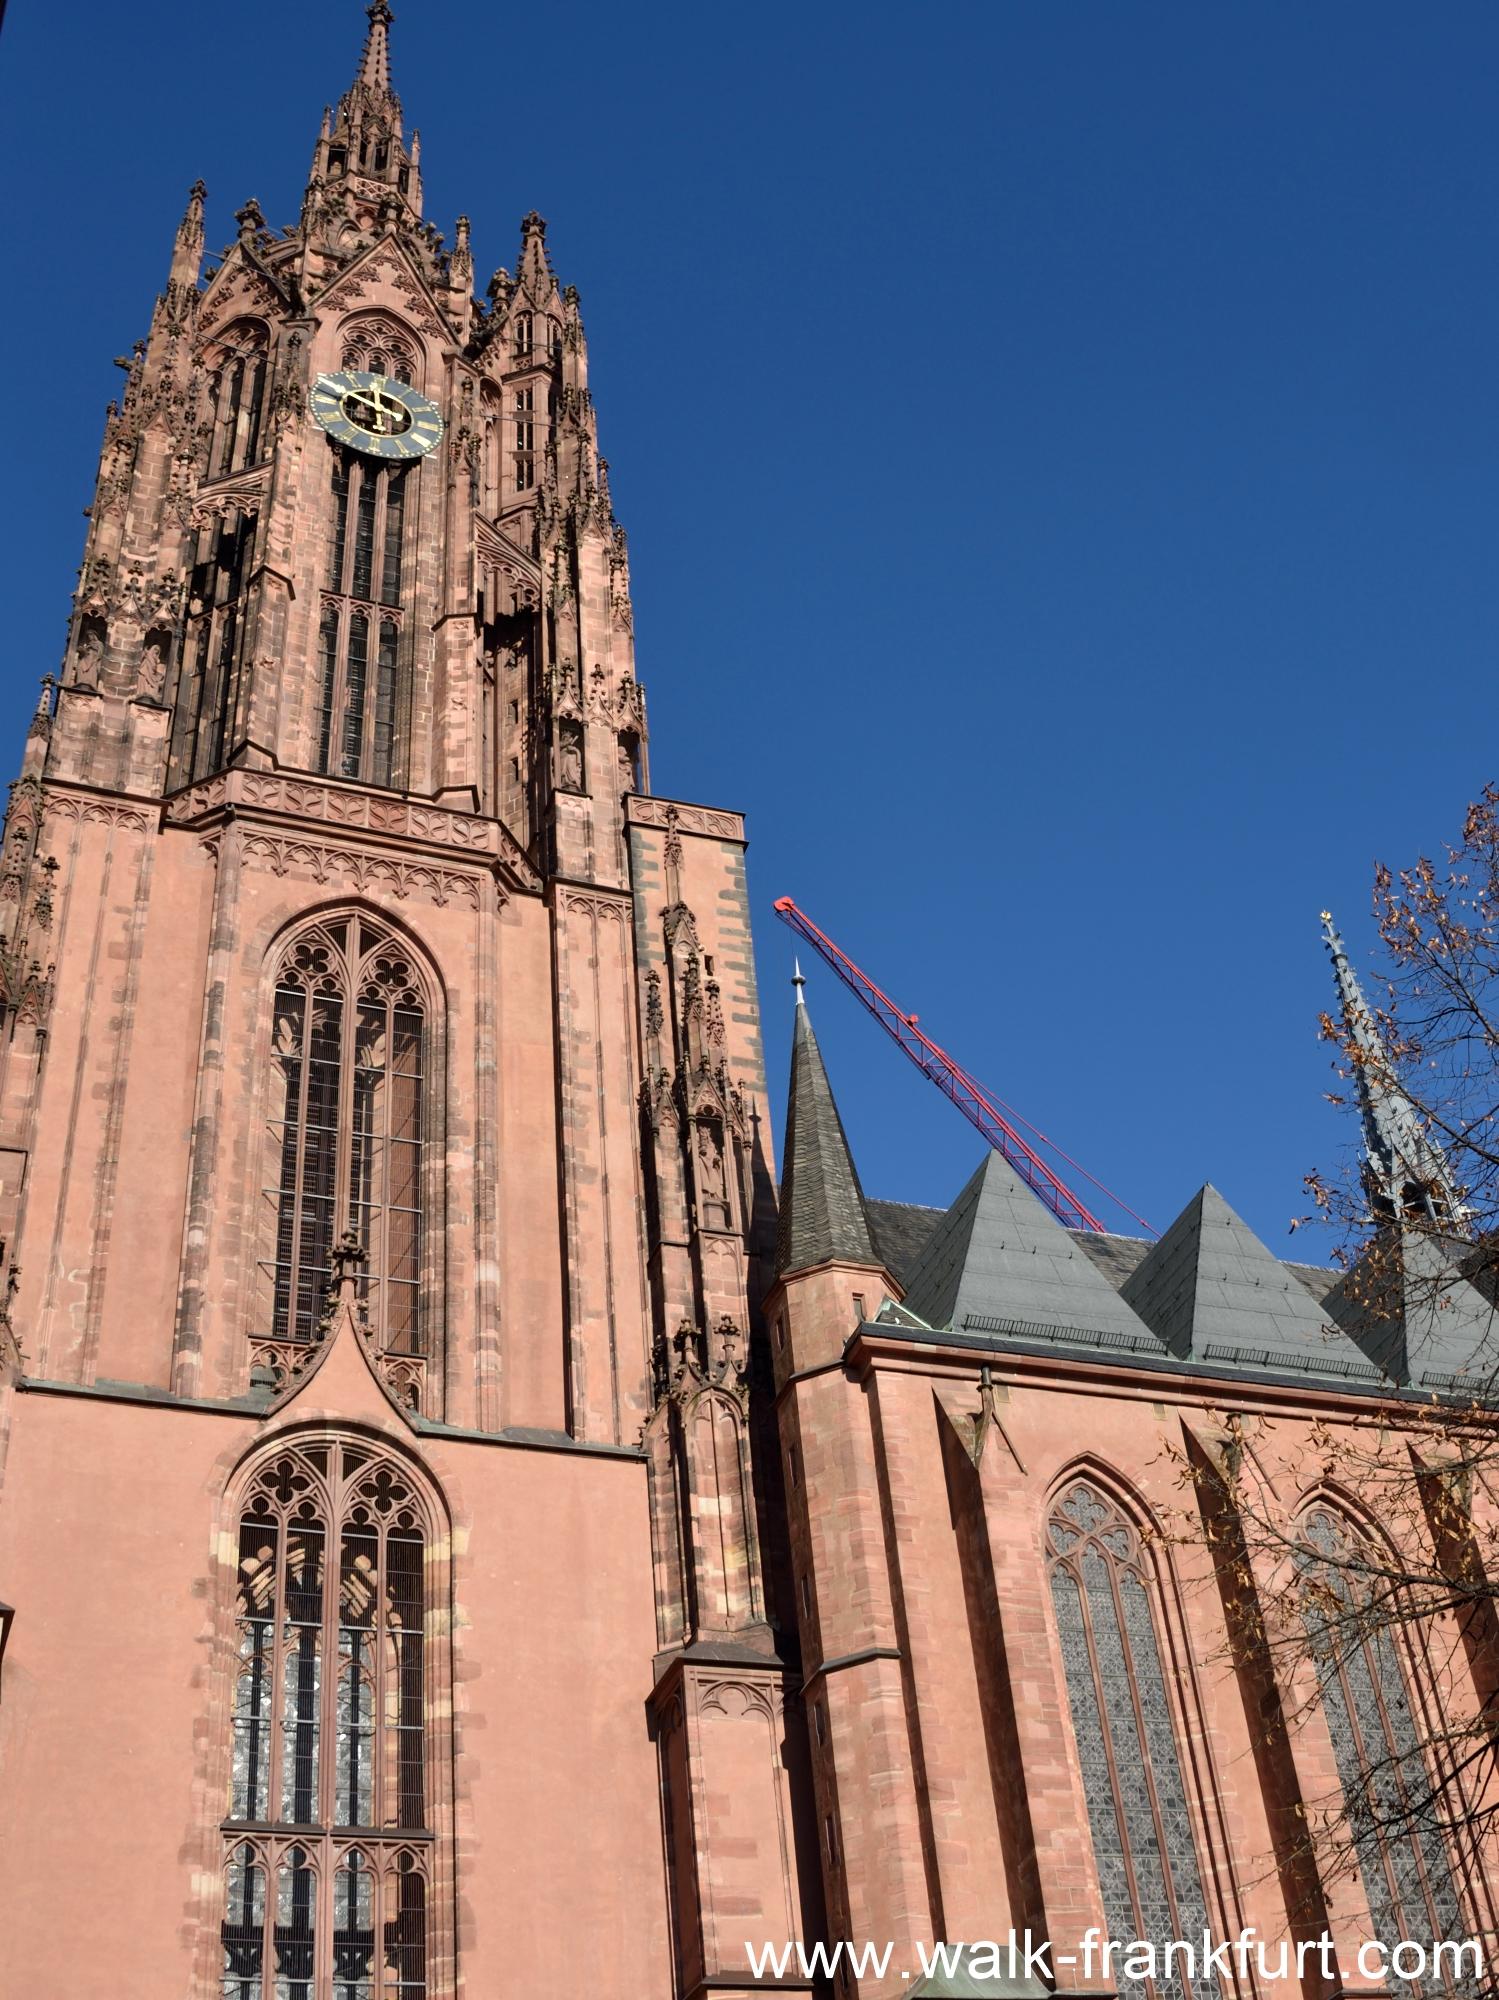 Frankfurt cathedral (Kaiserdom)